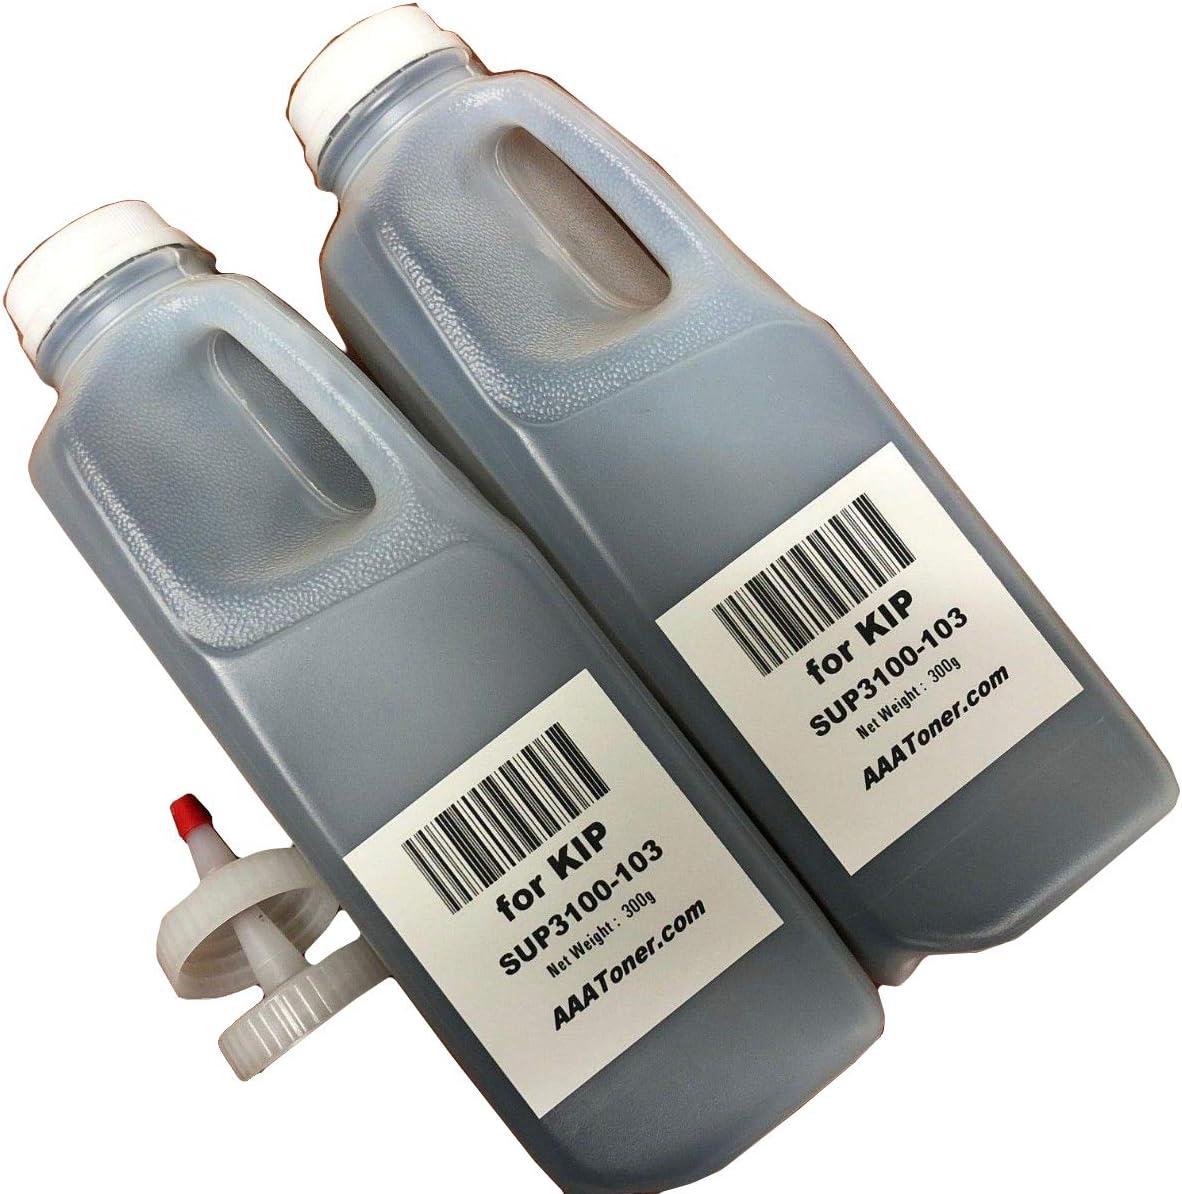 SUP7100-103 300g x 2 2 pk Toner Refill for use in KIP 7100 Toner KIP 7100